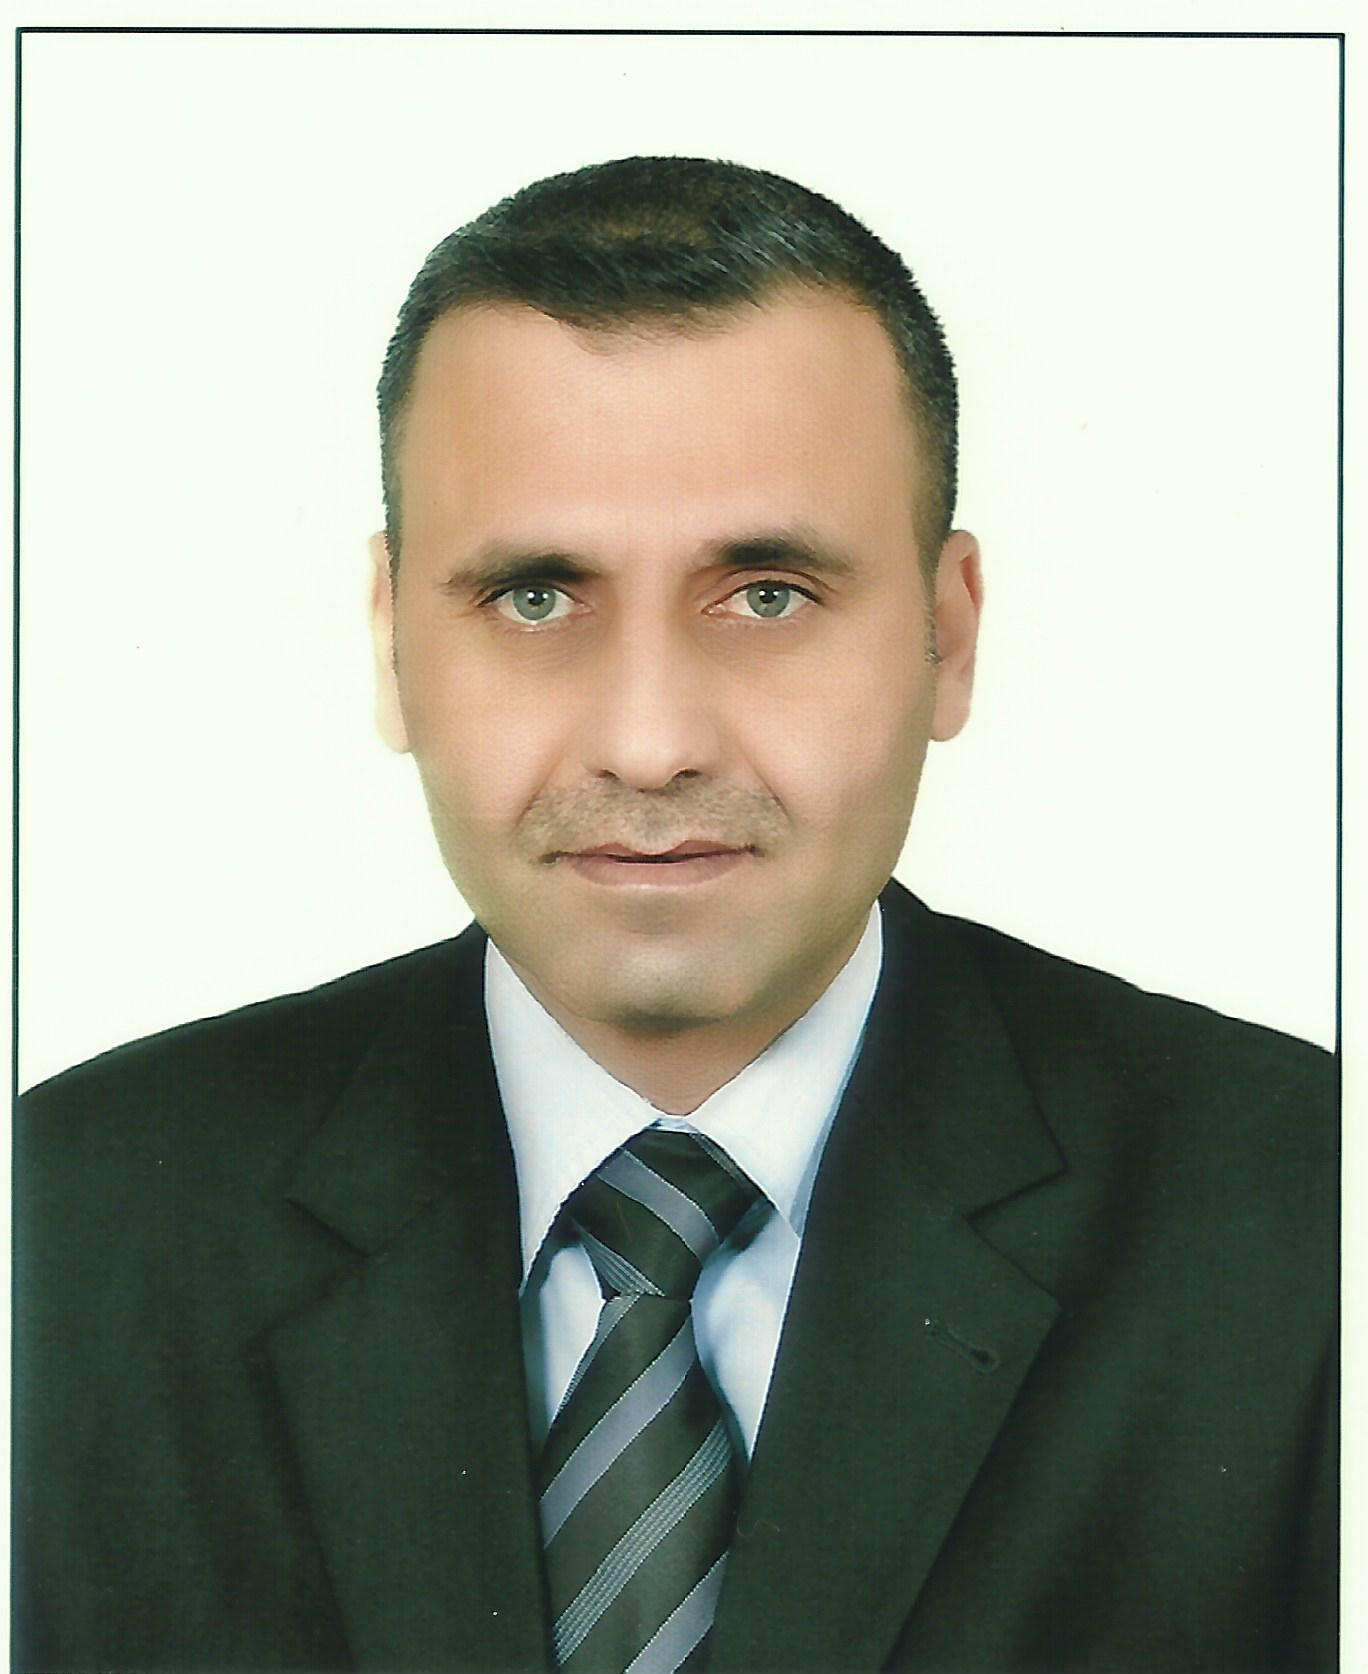 Asaad R S Al-Hilphy